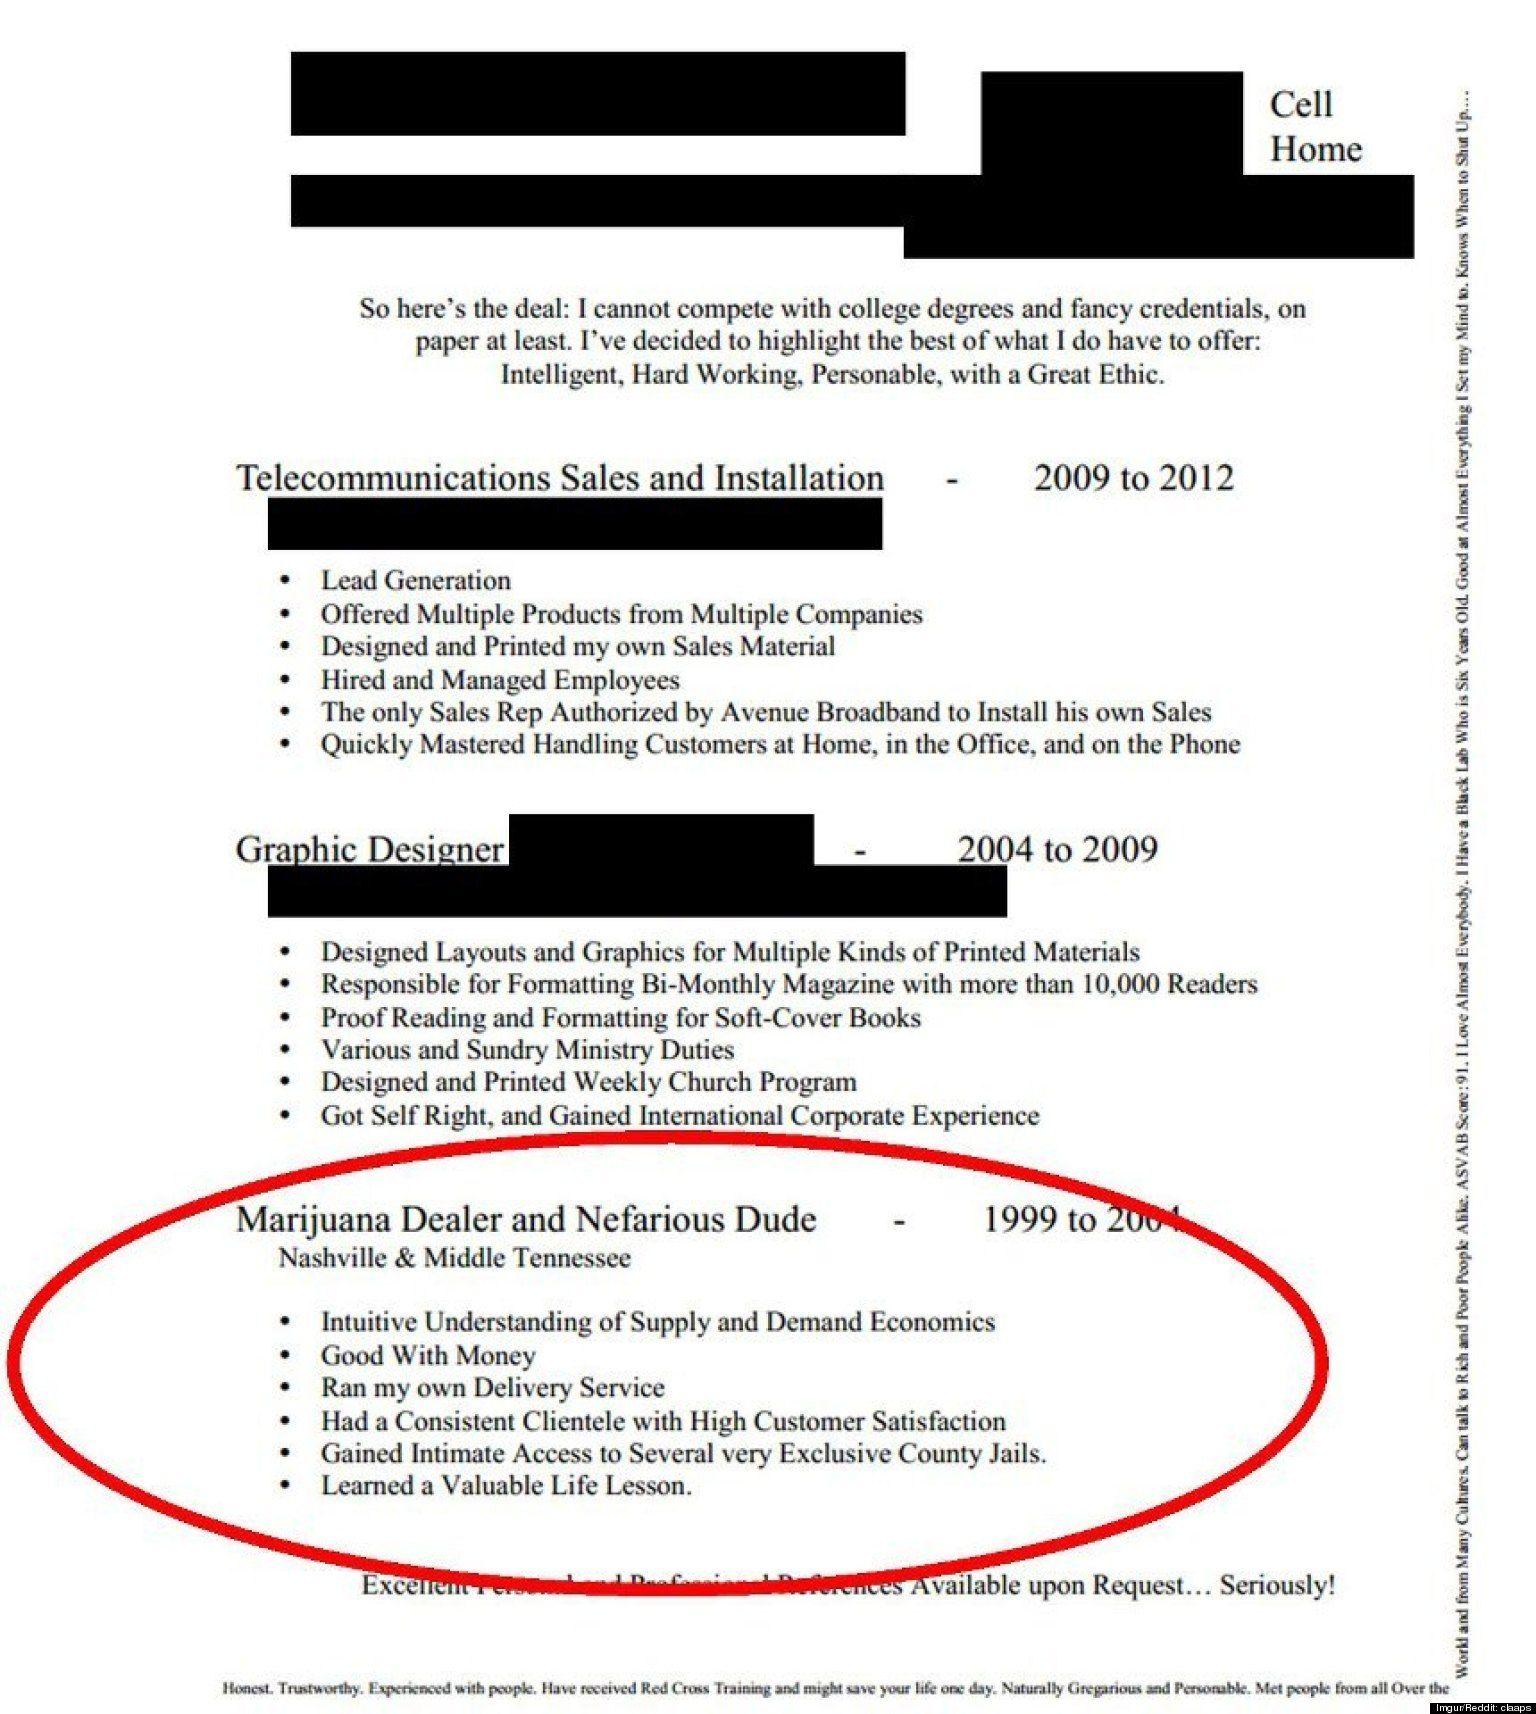 Look Guy S Resume Lists Experience As Marijuana Dealer And